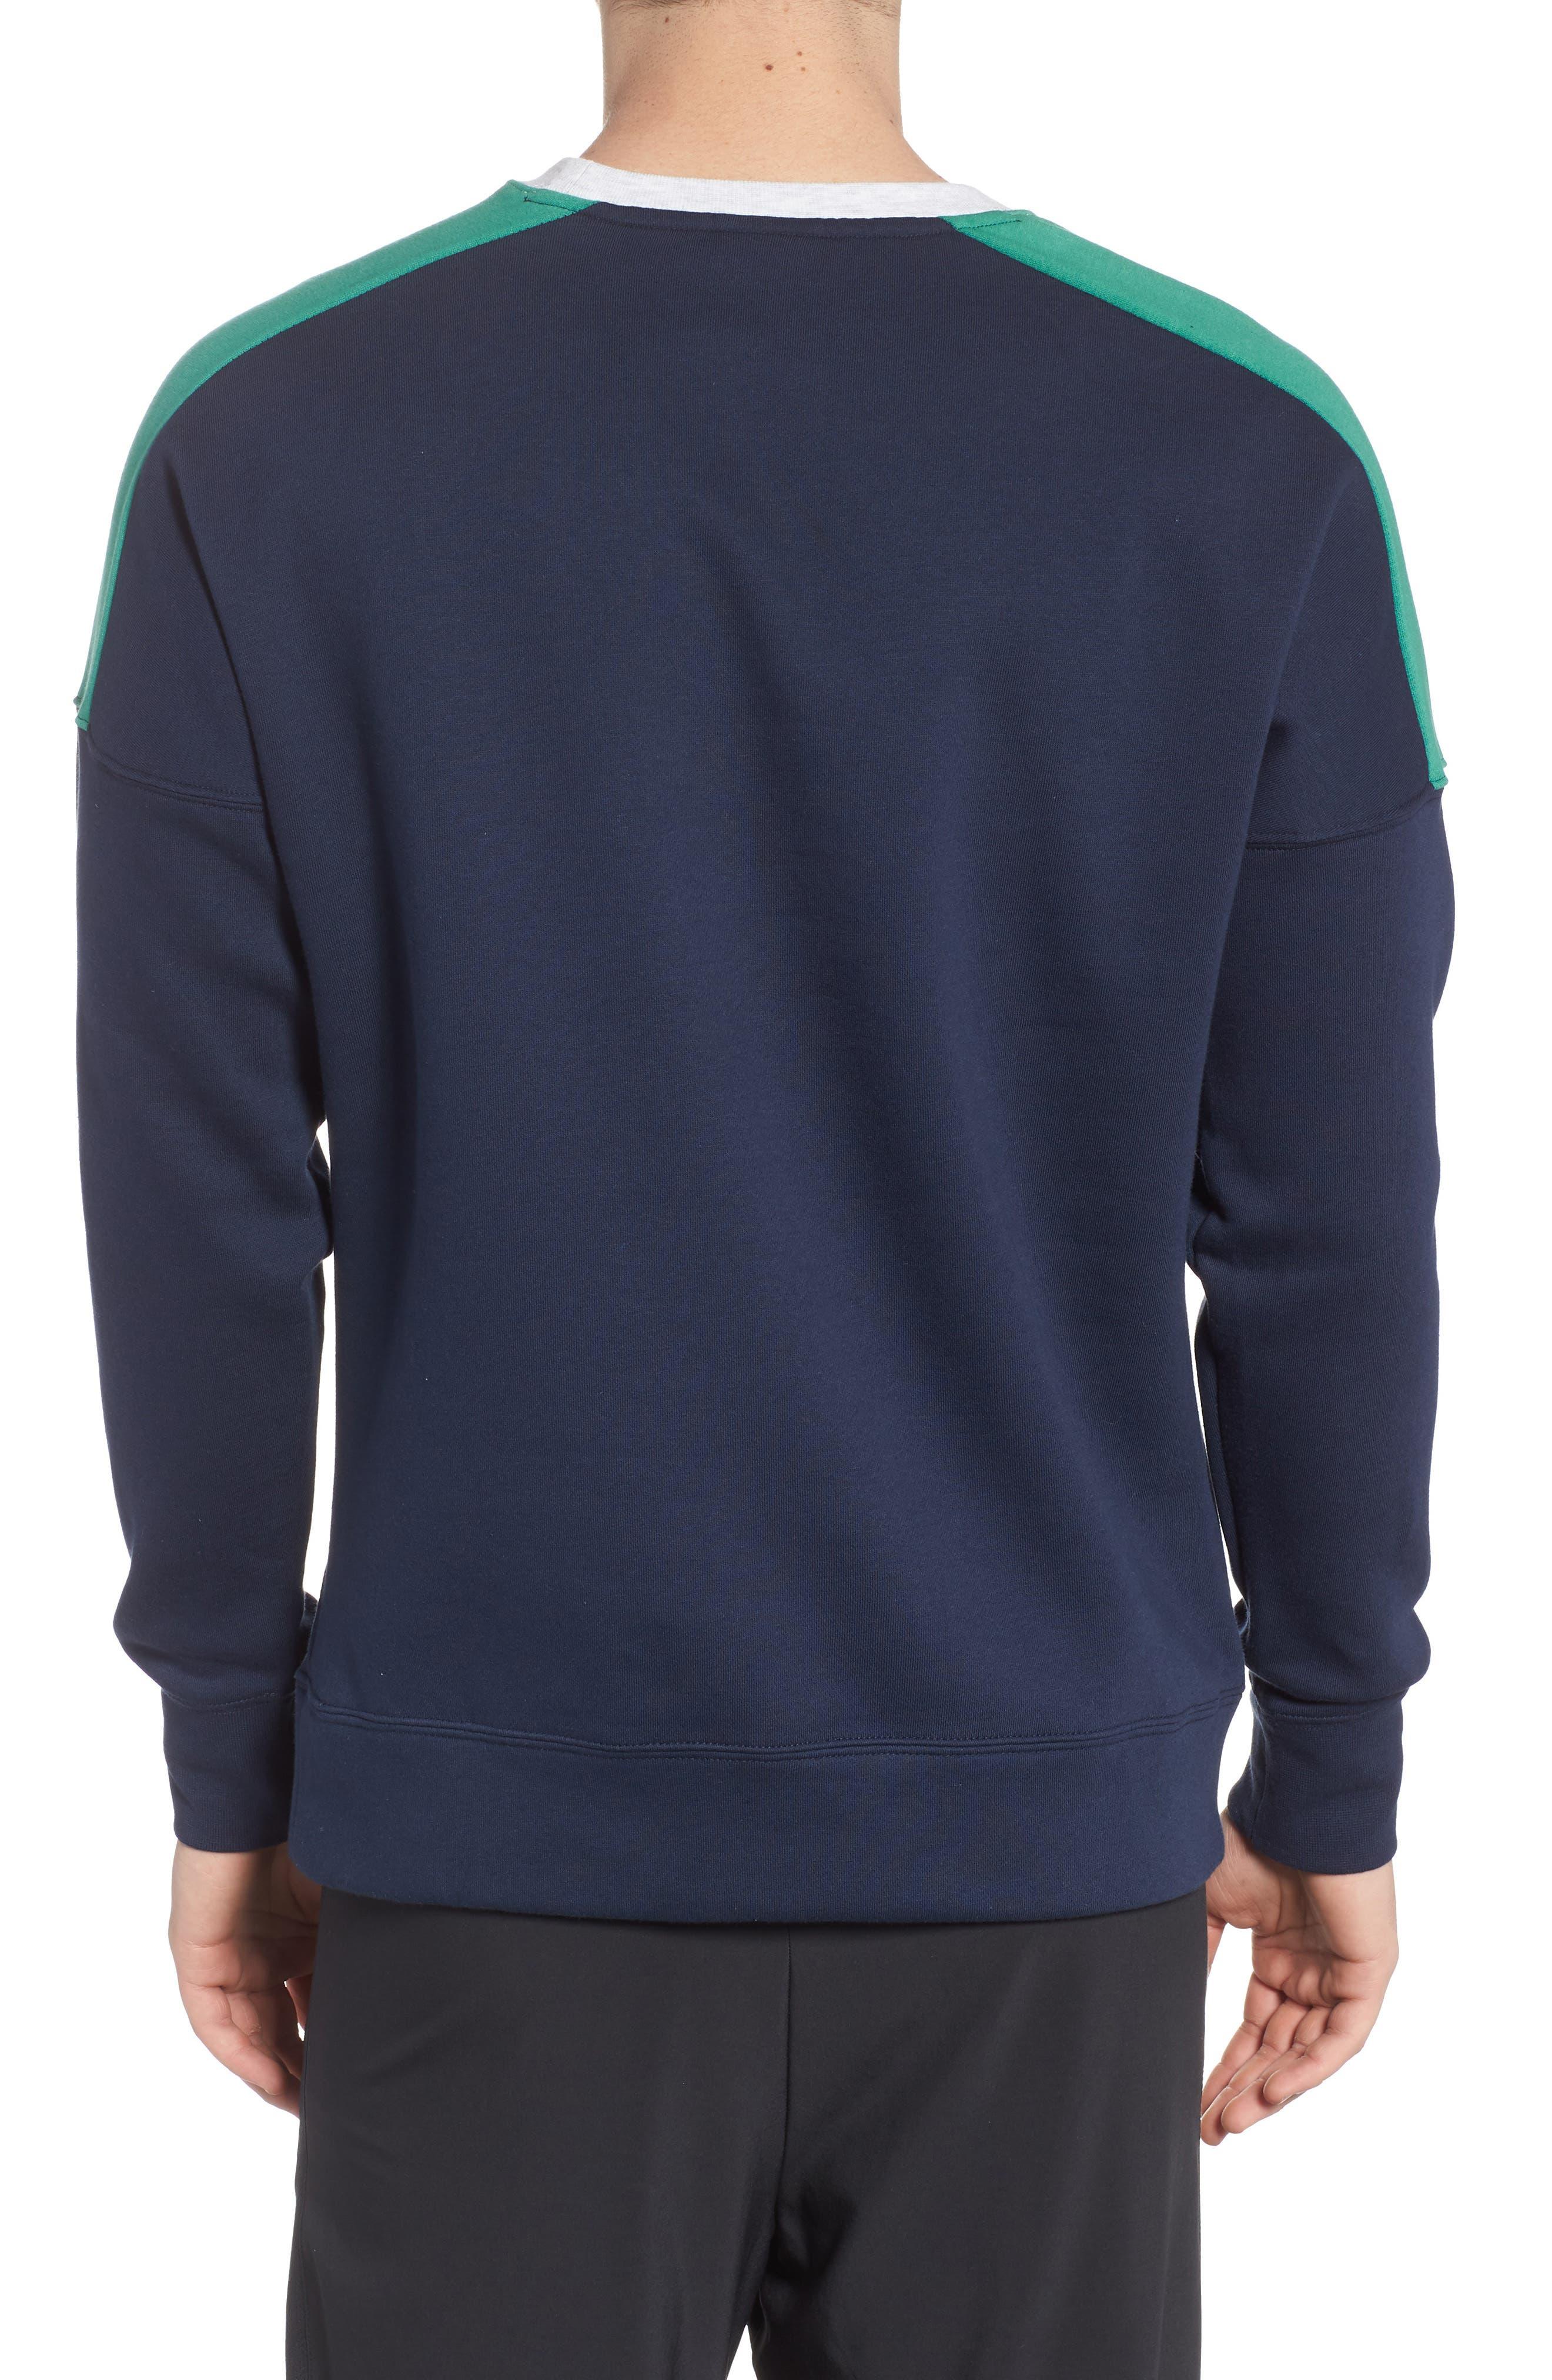 NSW Air Crewneck Sweatshirt,                             Alternate thumbnail 2, color,                             Birch/ Green/ Obsidian/ White